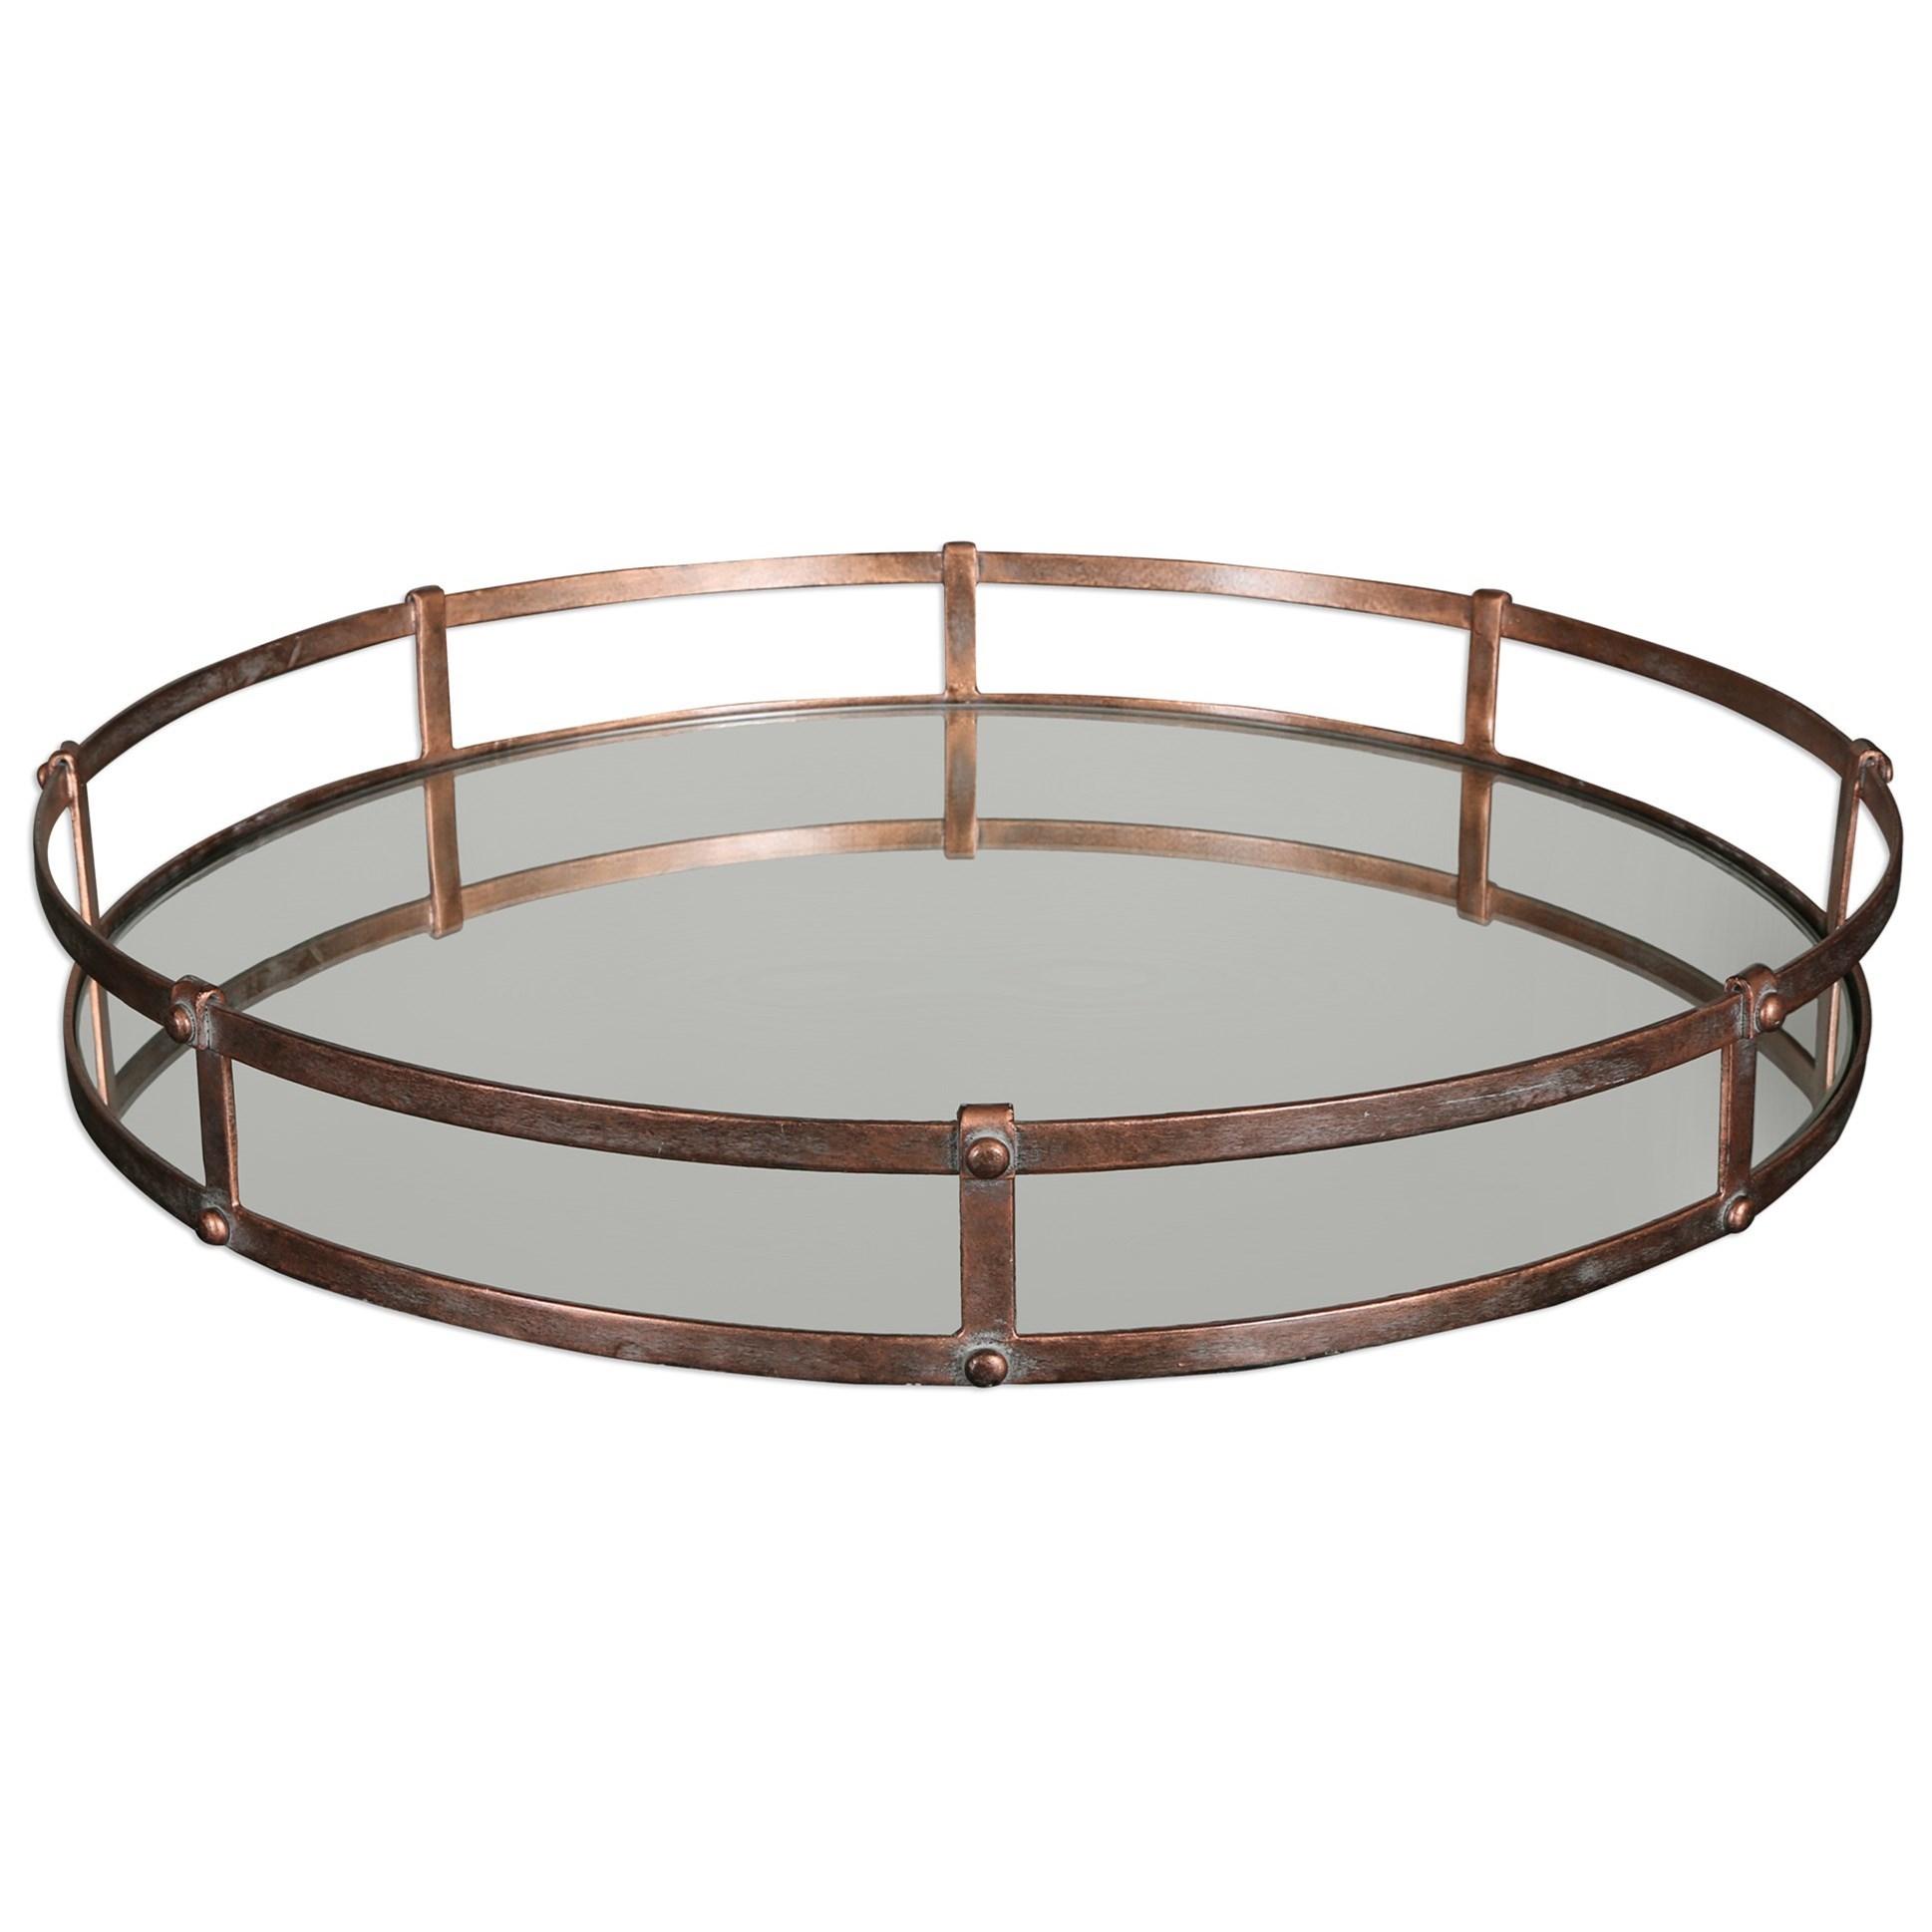 Uttermost Accessories Nunzio Mirrored Tray - Item Number: 20045